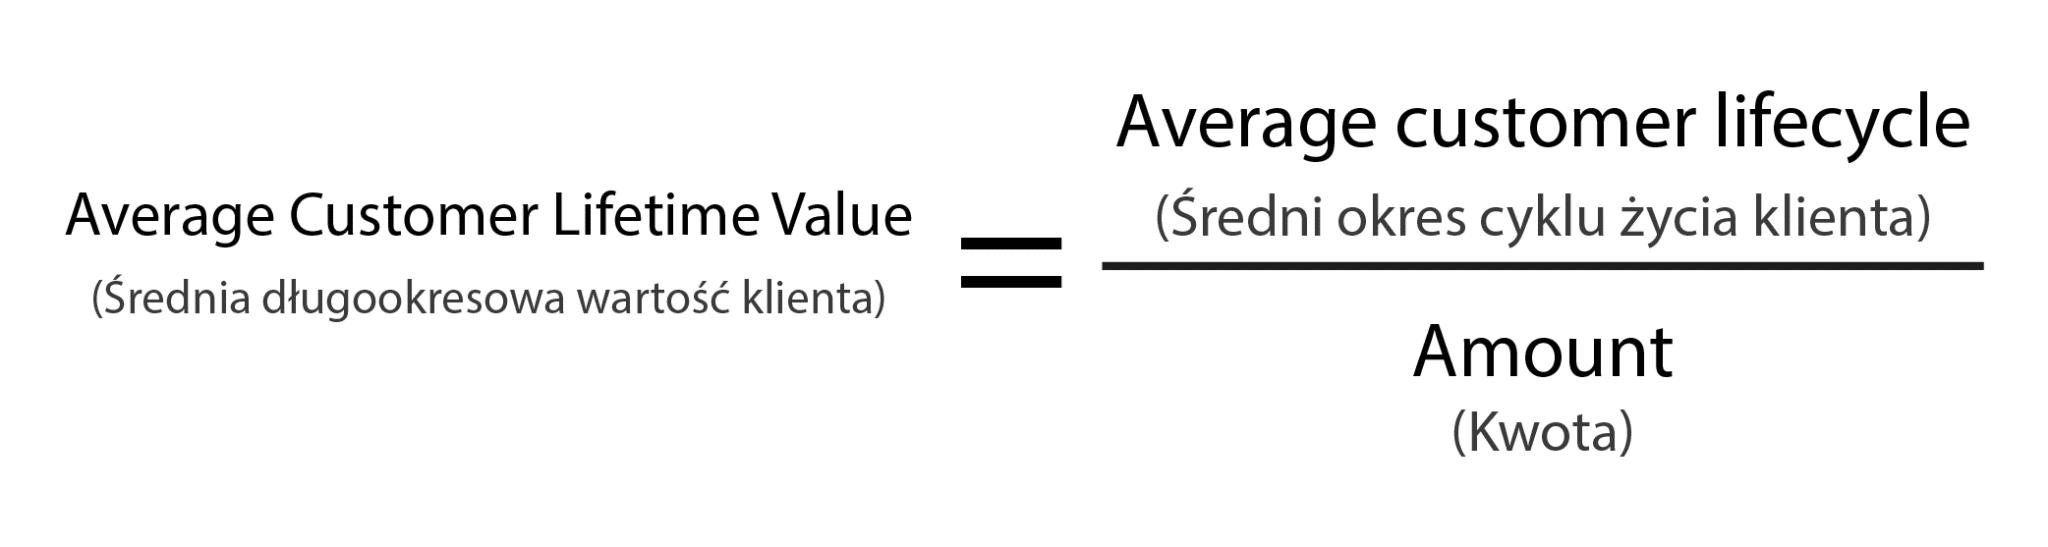 Average Customer Lifetime Value